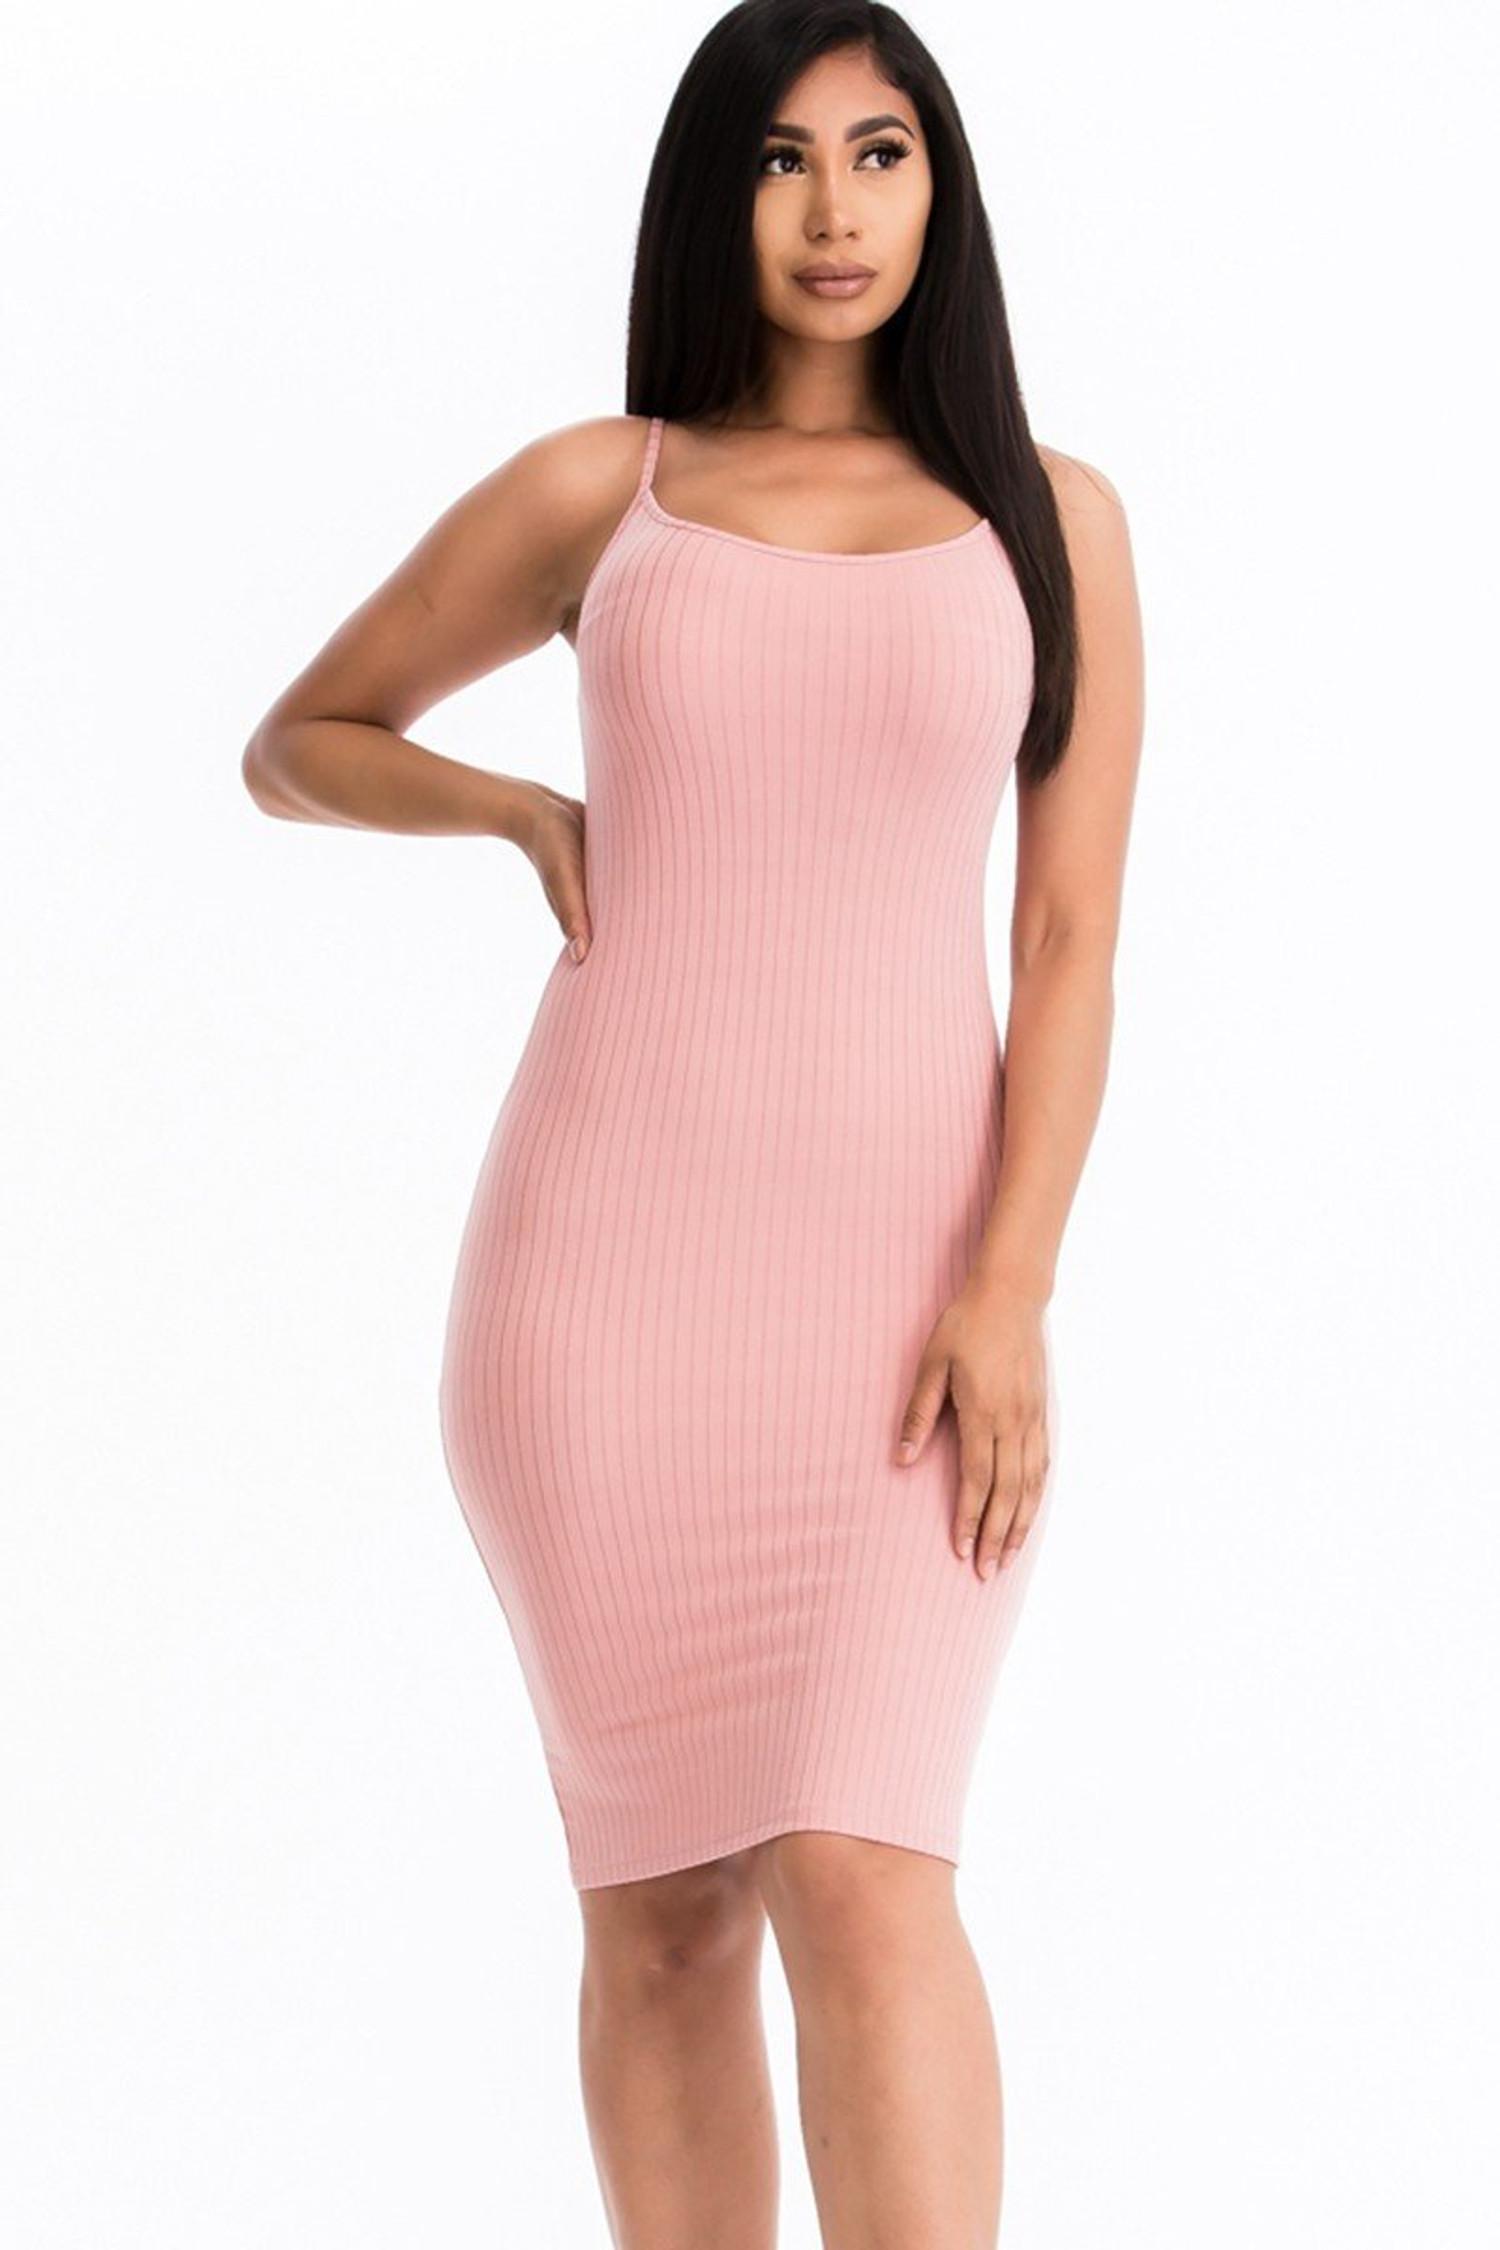 Spaghetti Strap Rib Knit Bodycon Cami Dress